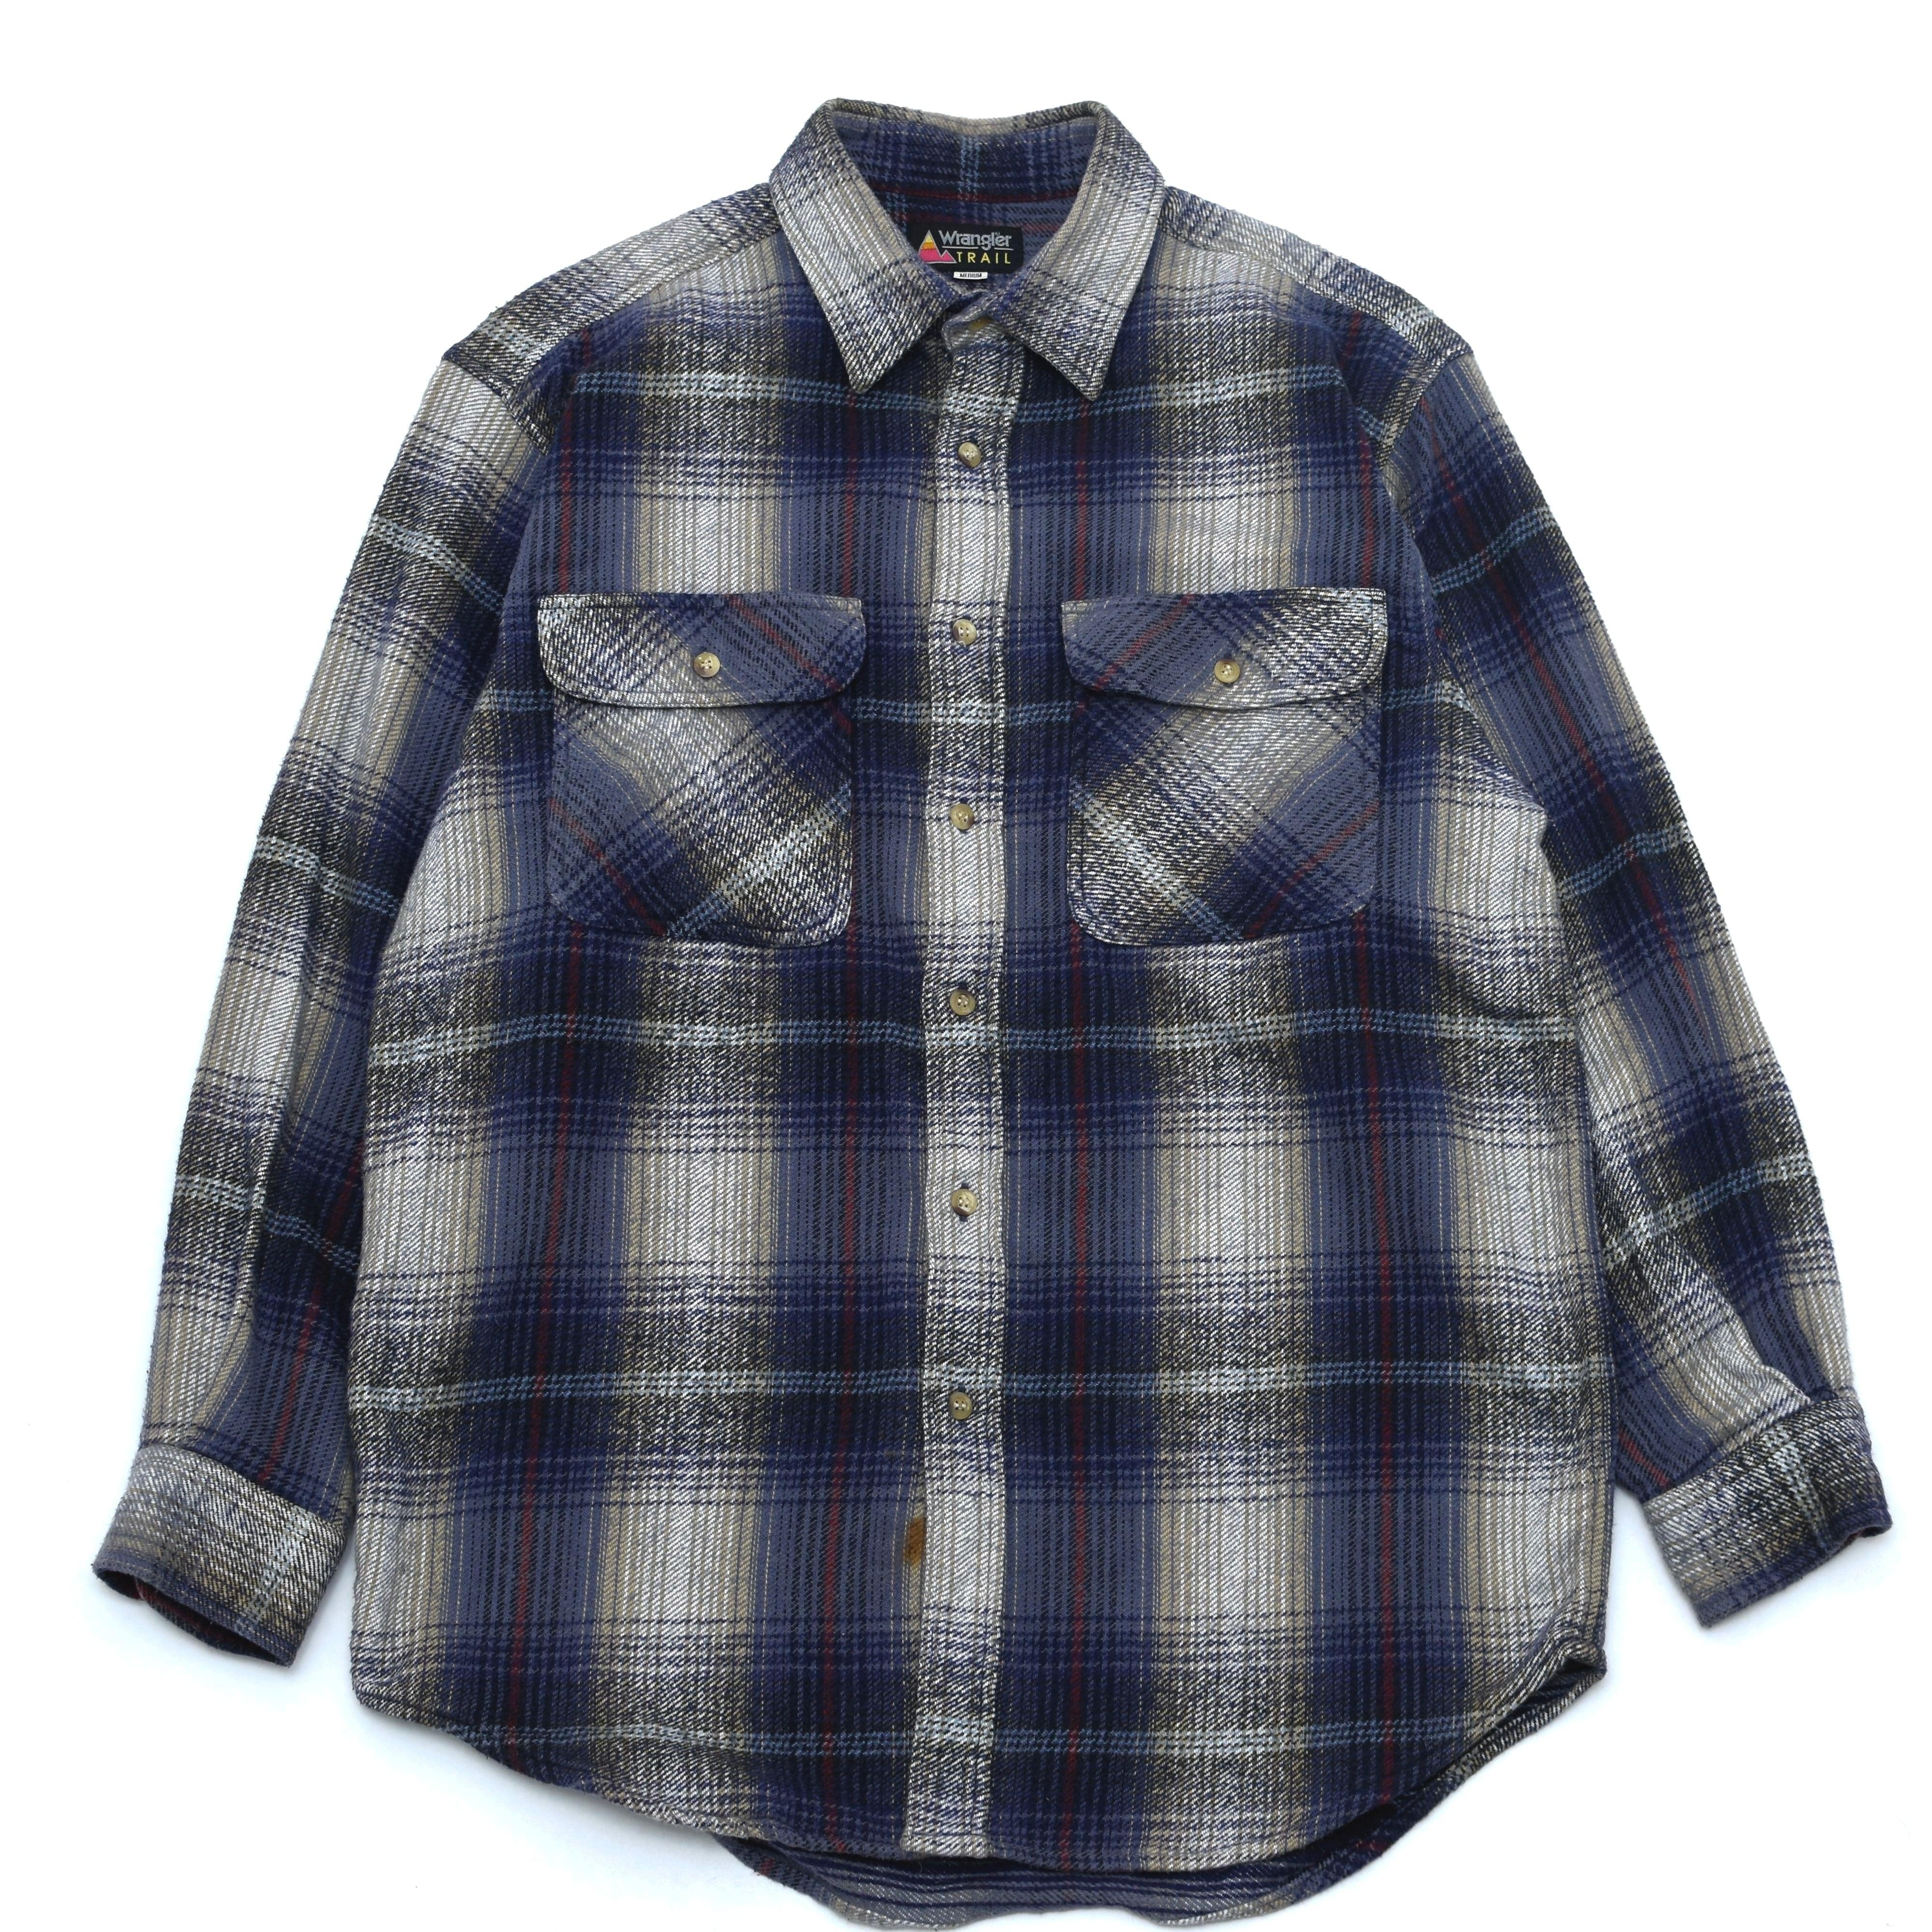 90's Wrangler heavy weight flannel shirt